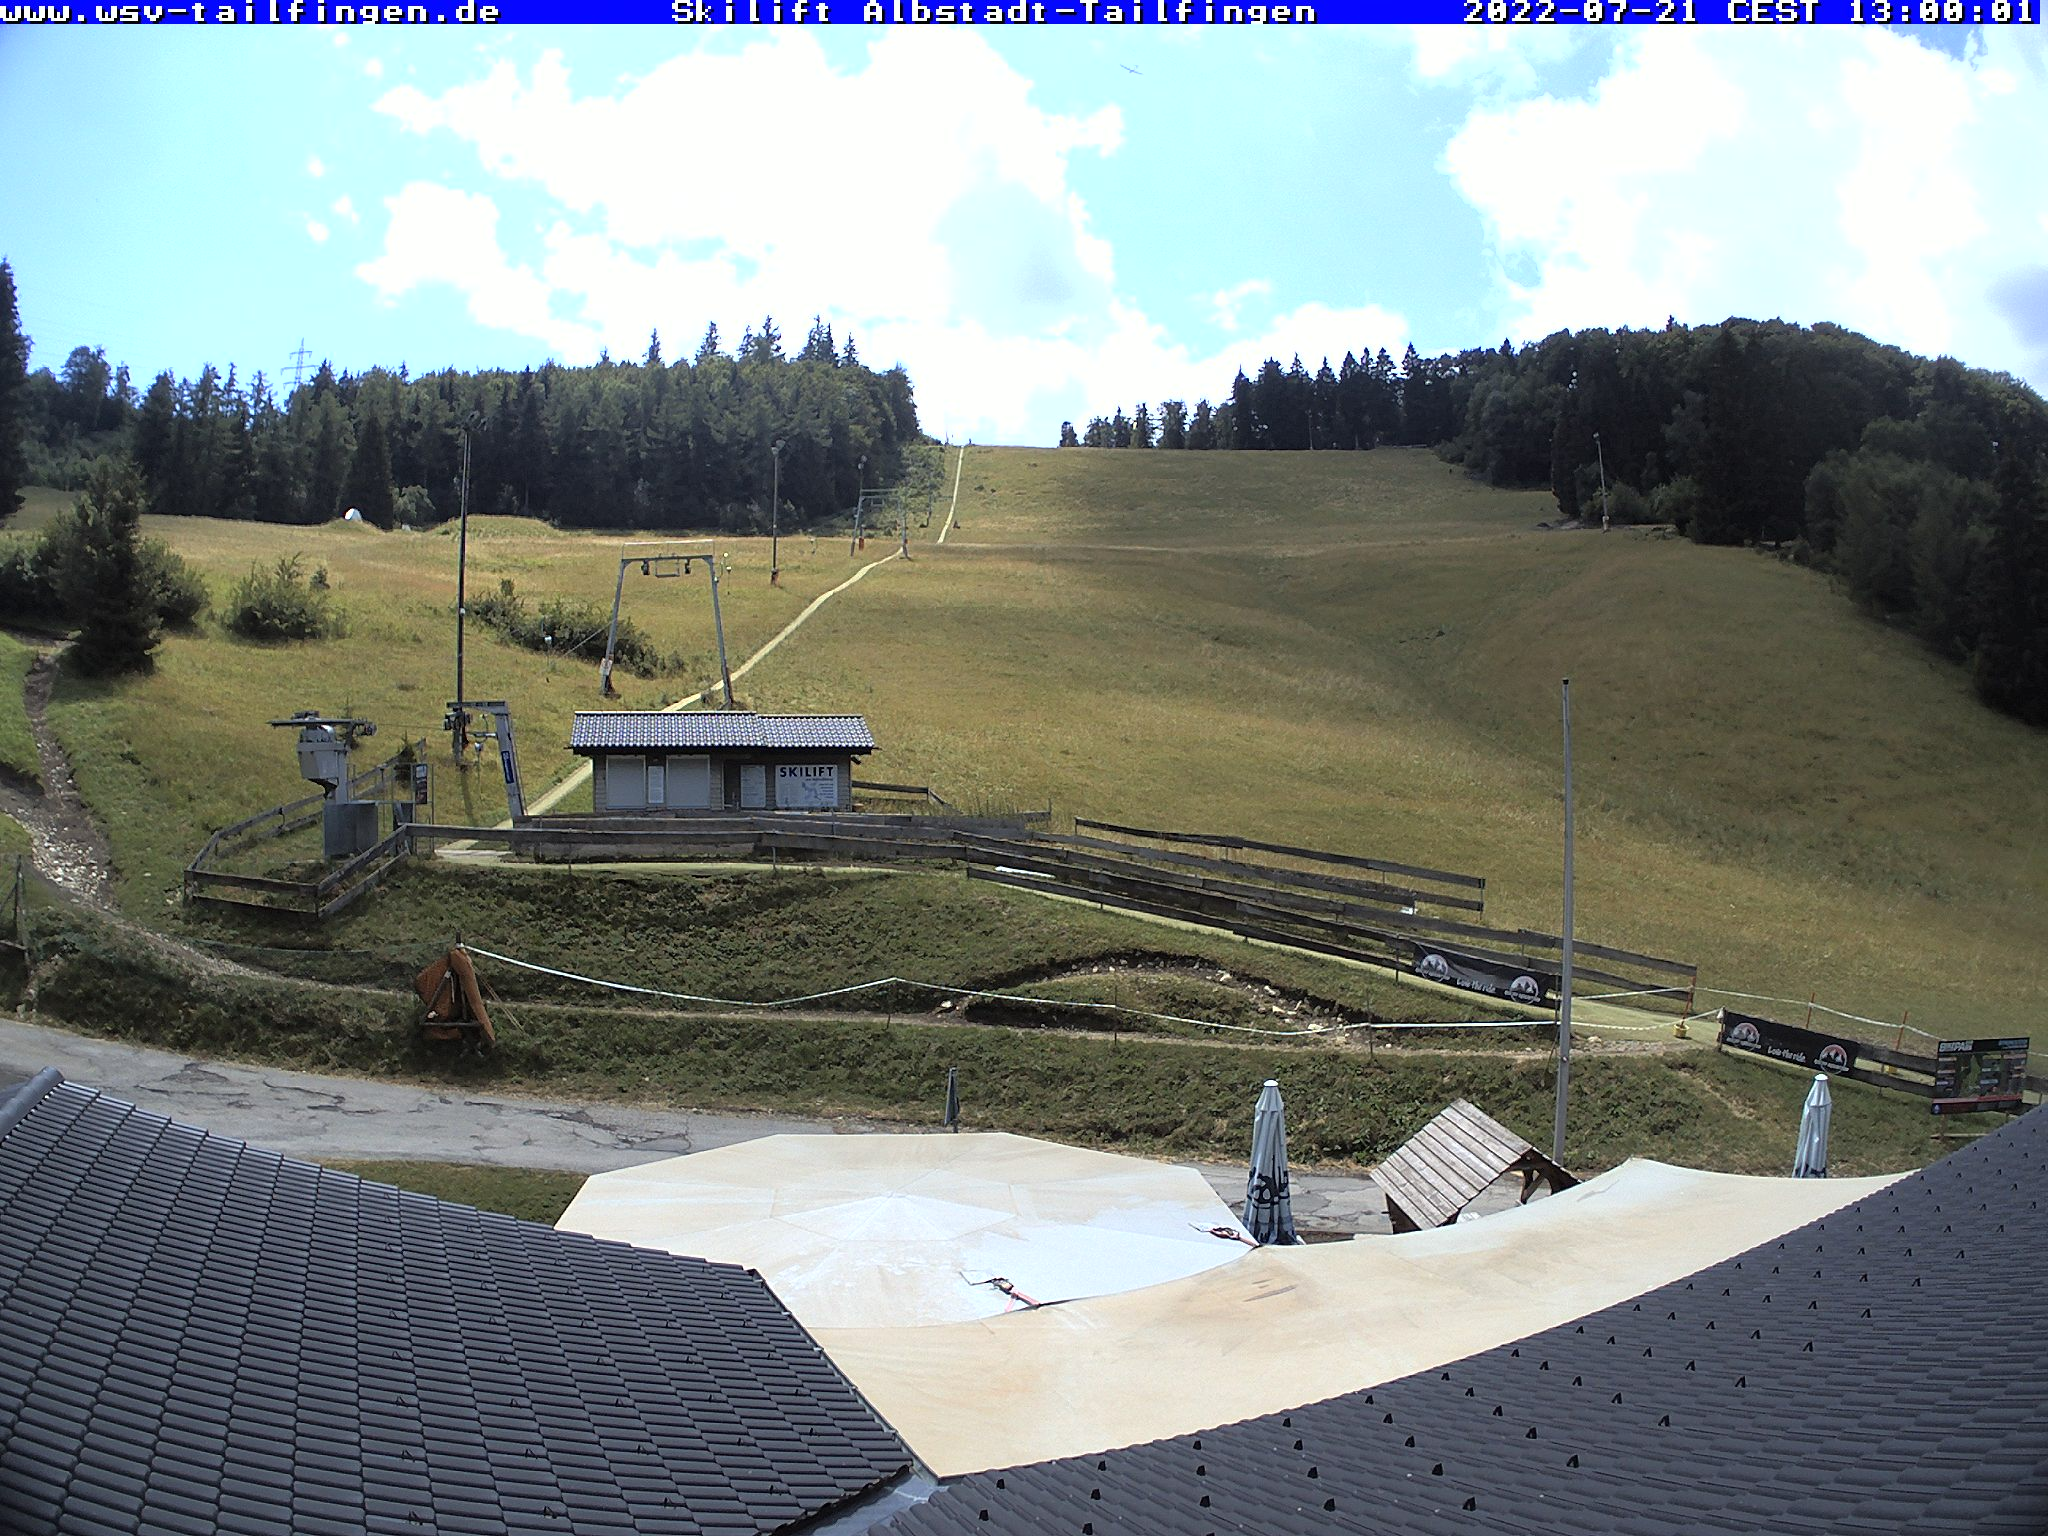 Webcam-Foto 13:00 Uhr / Skilift Albstadt-Tailfingen